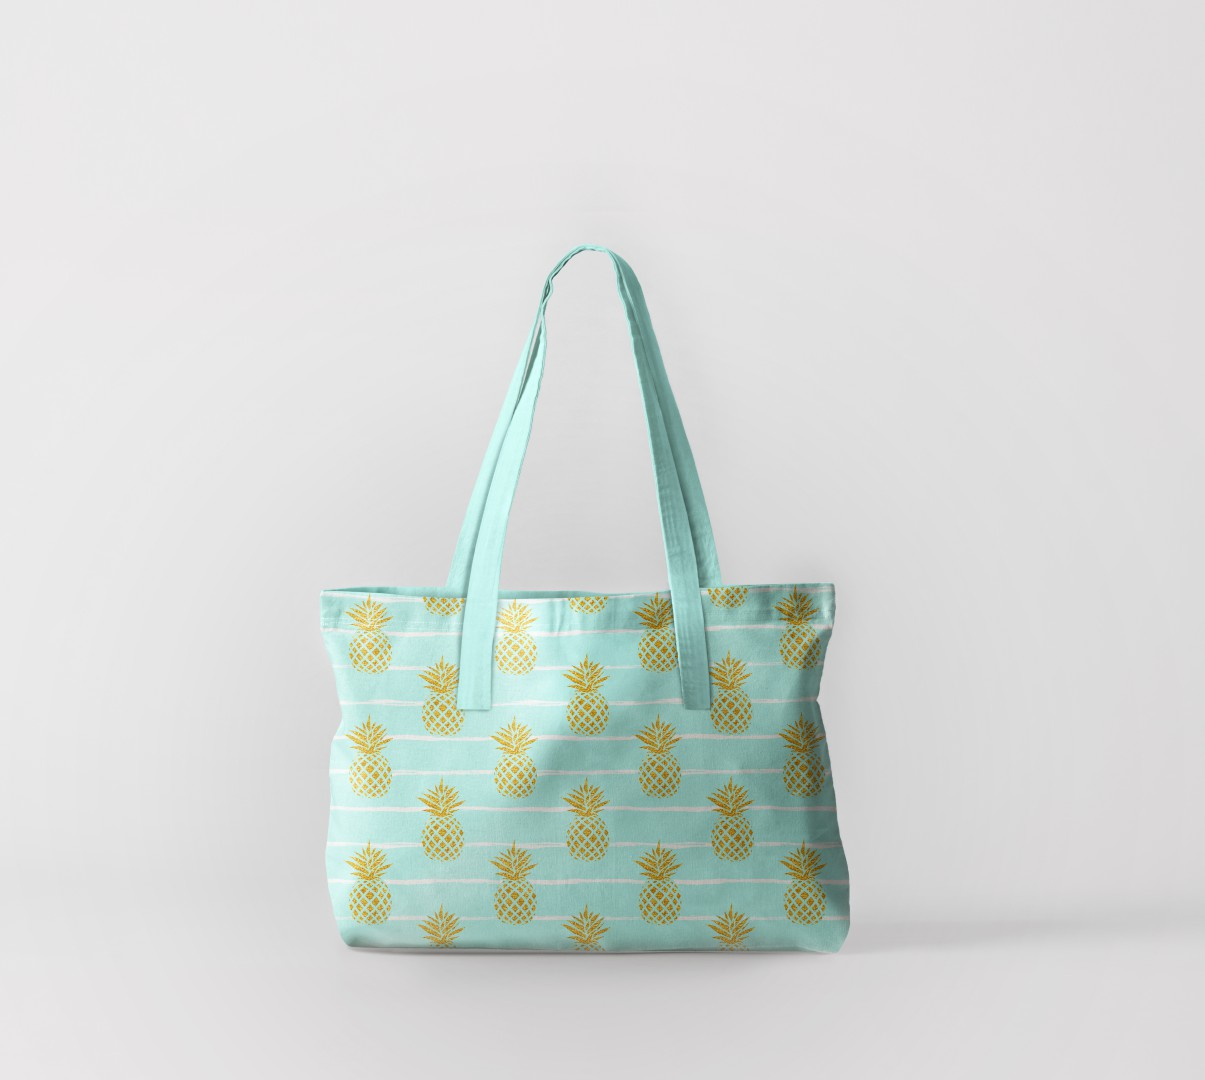 Пляжная сумка Нежные ананасы 2 (50х40 см) Олимп Текстиль oli732584